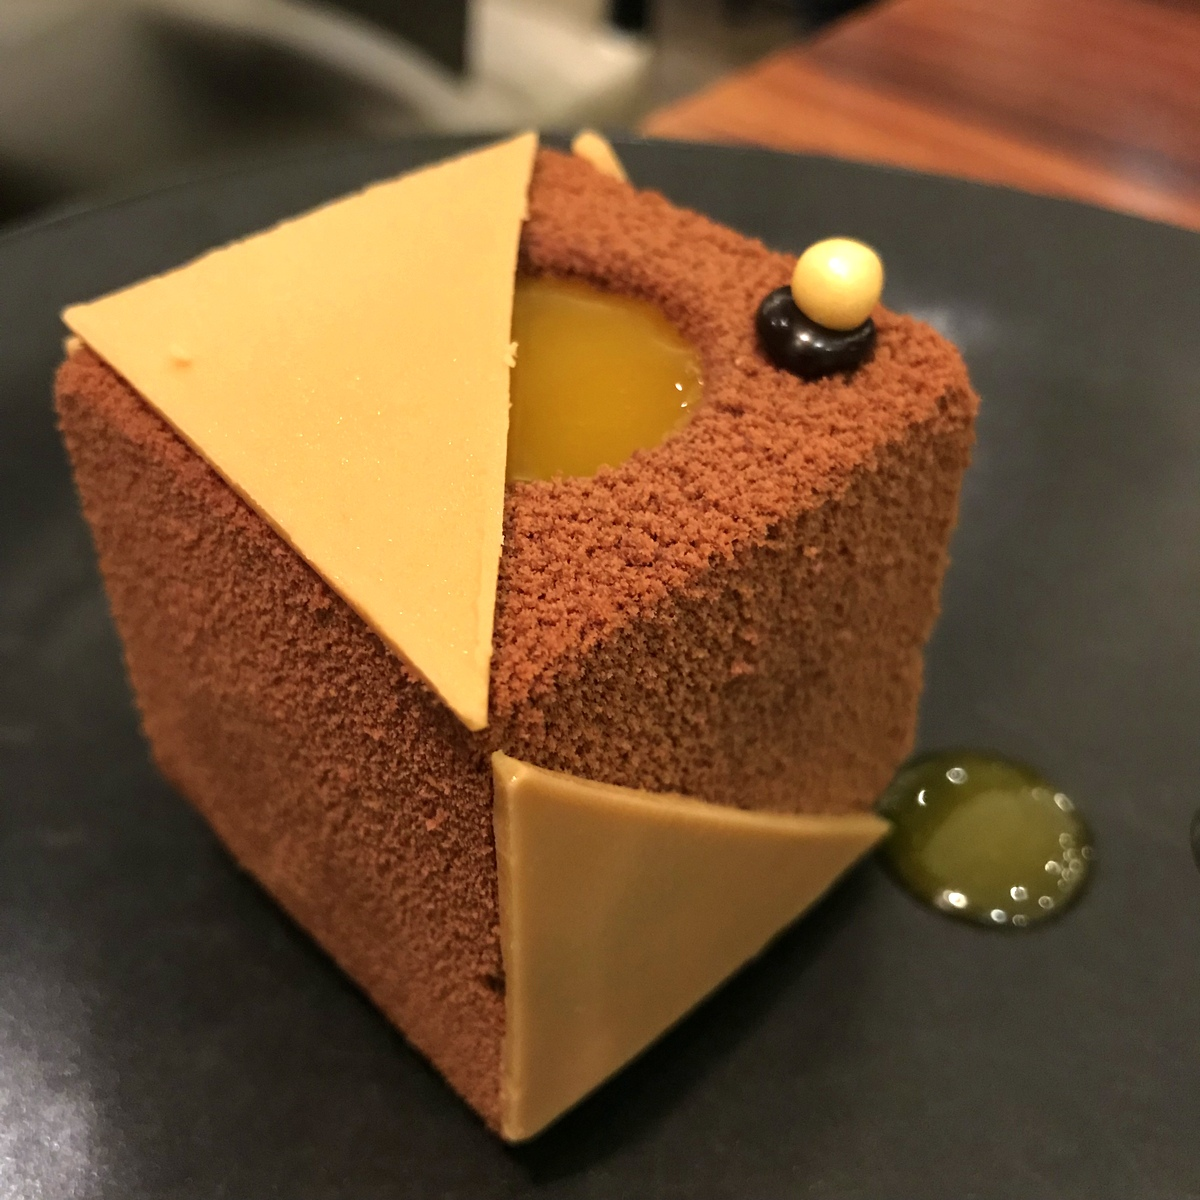 16 Haussmann - Dîner avec Smartbox